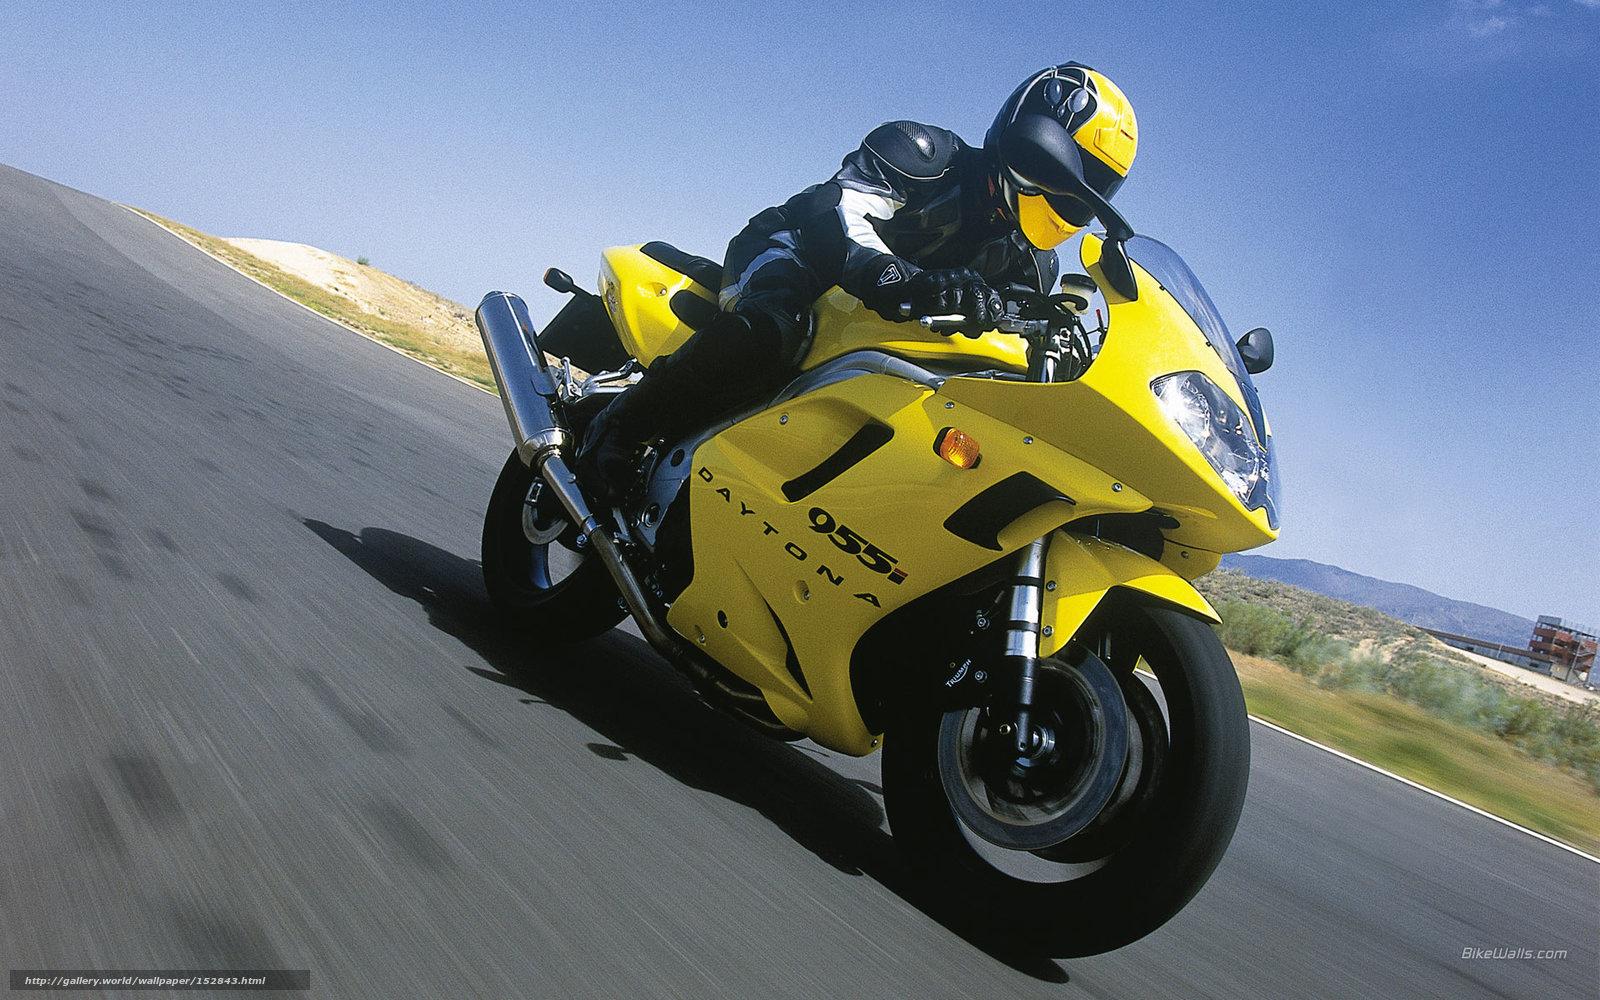 Картинки для мотоциклистов меня реакция